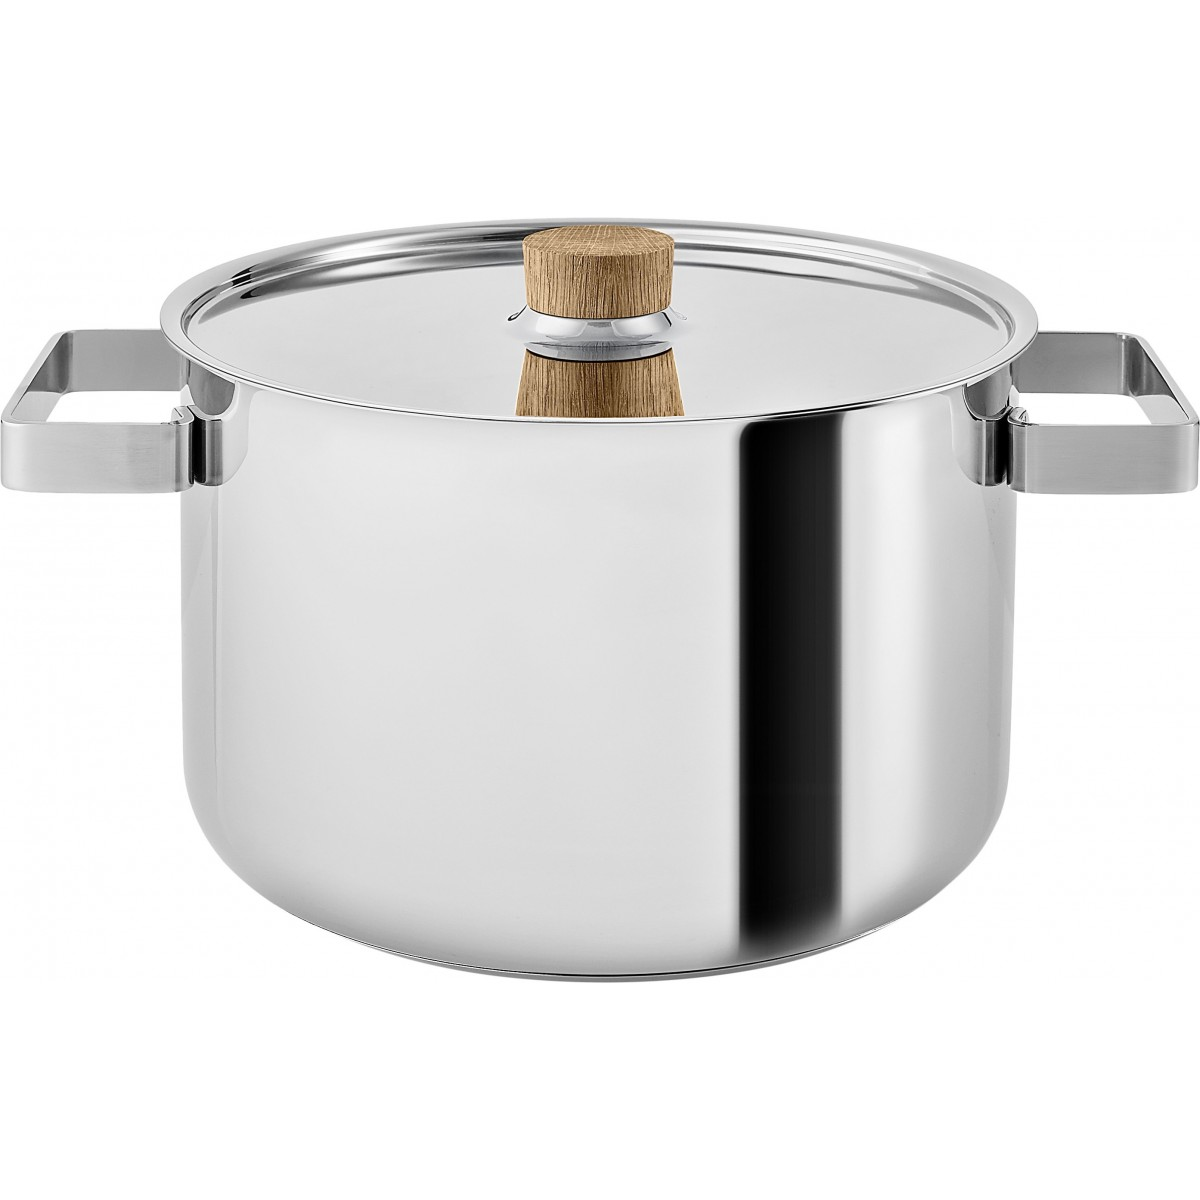 EVA SOLO Nordic kitchen gryde 4,0 ltr